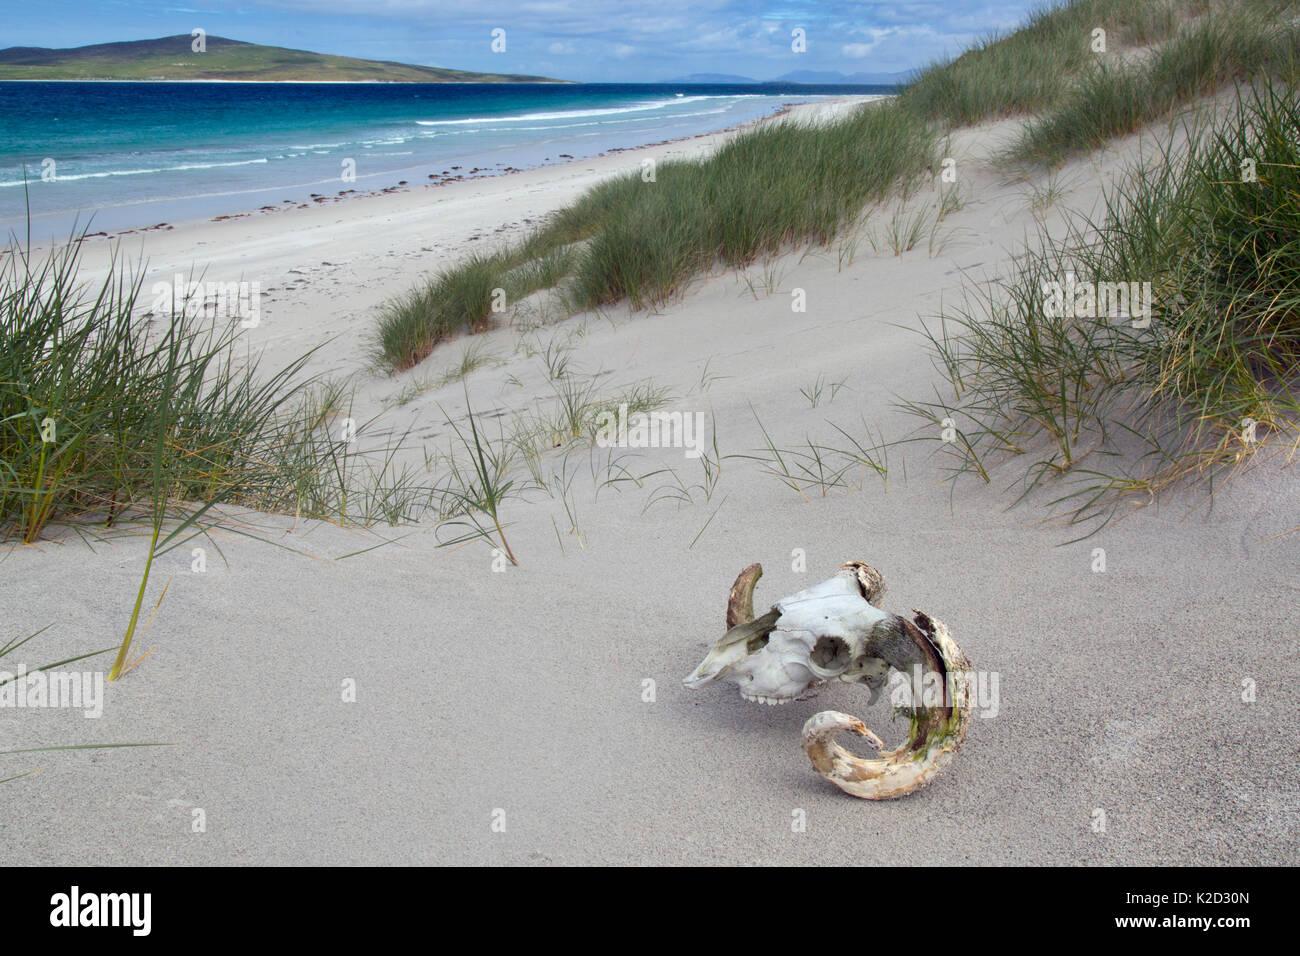 Skull of Hebridean sheep on beach and sea,  Traigh Lar, North Uist, Hebrides, Scotland, UK, June. - Stock Image